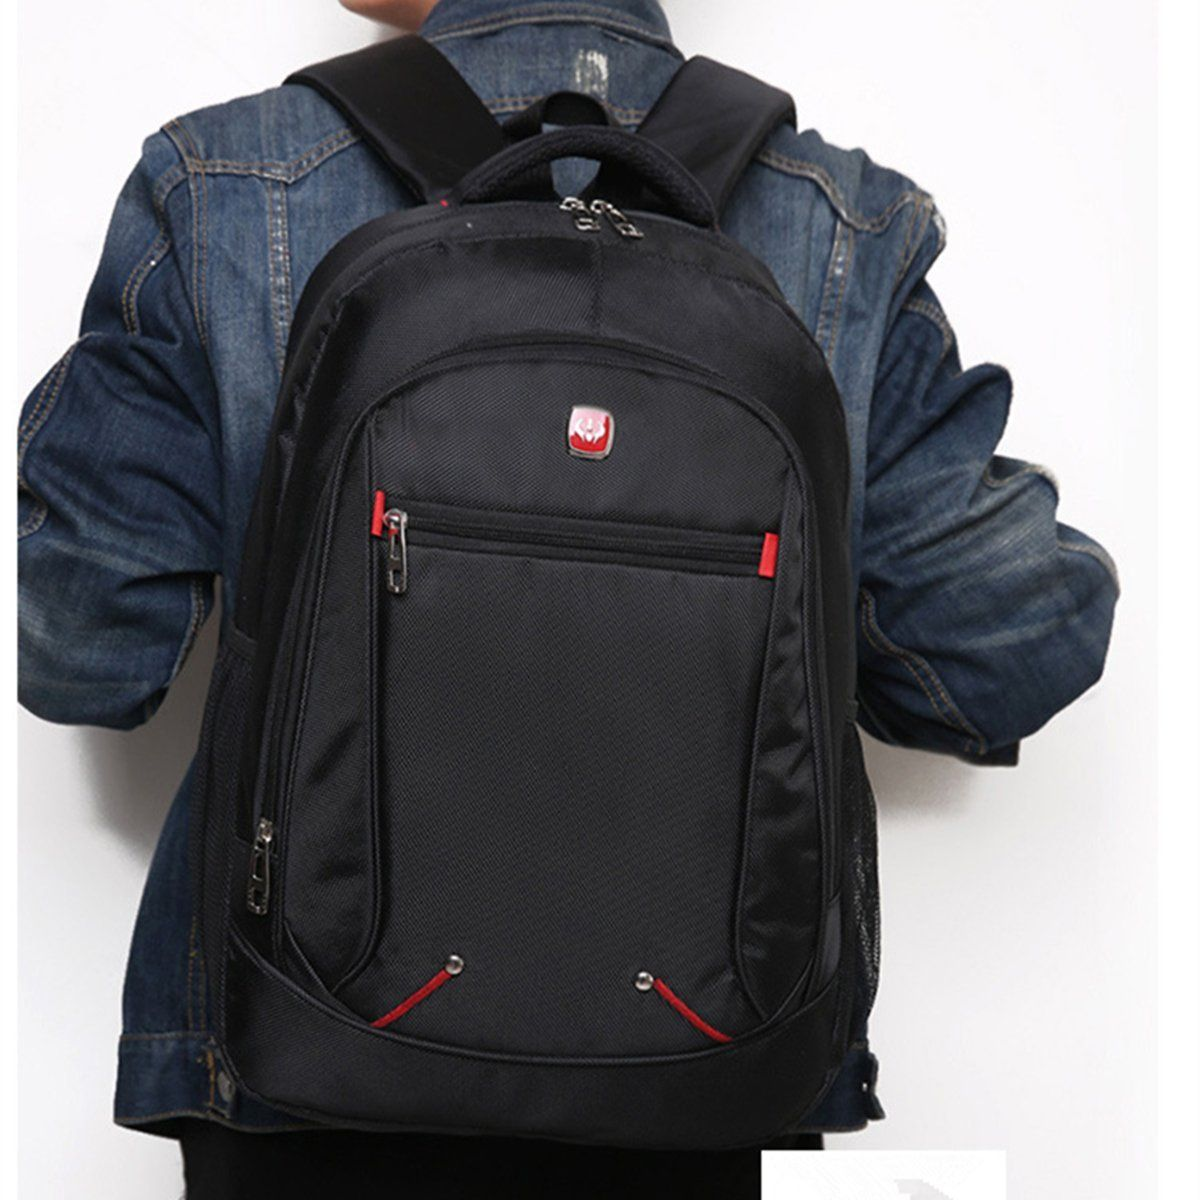 Men Women Laptop Backpack Travel Hiking Rucksack Waterproof Sports Shoulder Bag